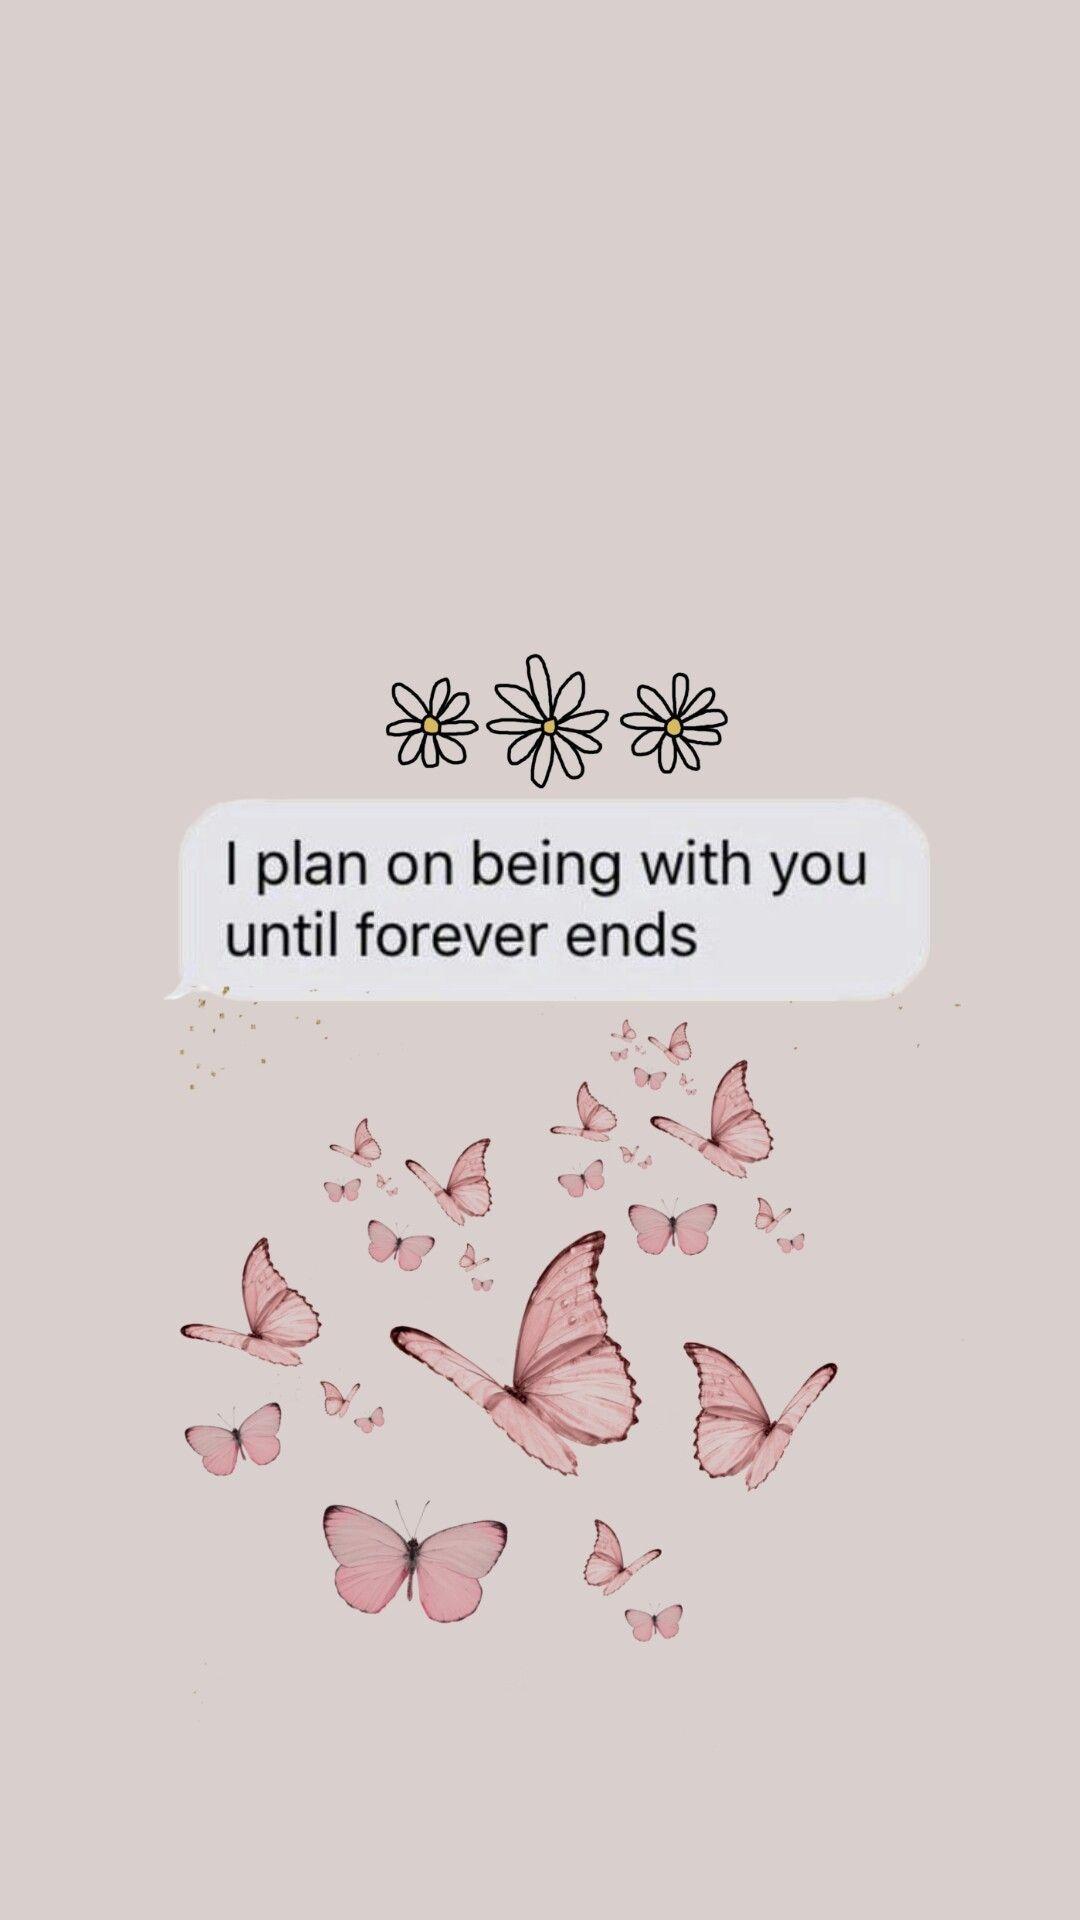 To My Crush In 2020 Butterfly Wallpaper Flower Iphone Wallpaper Wallpaper